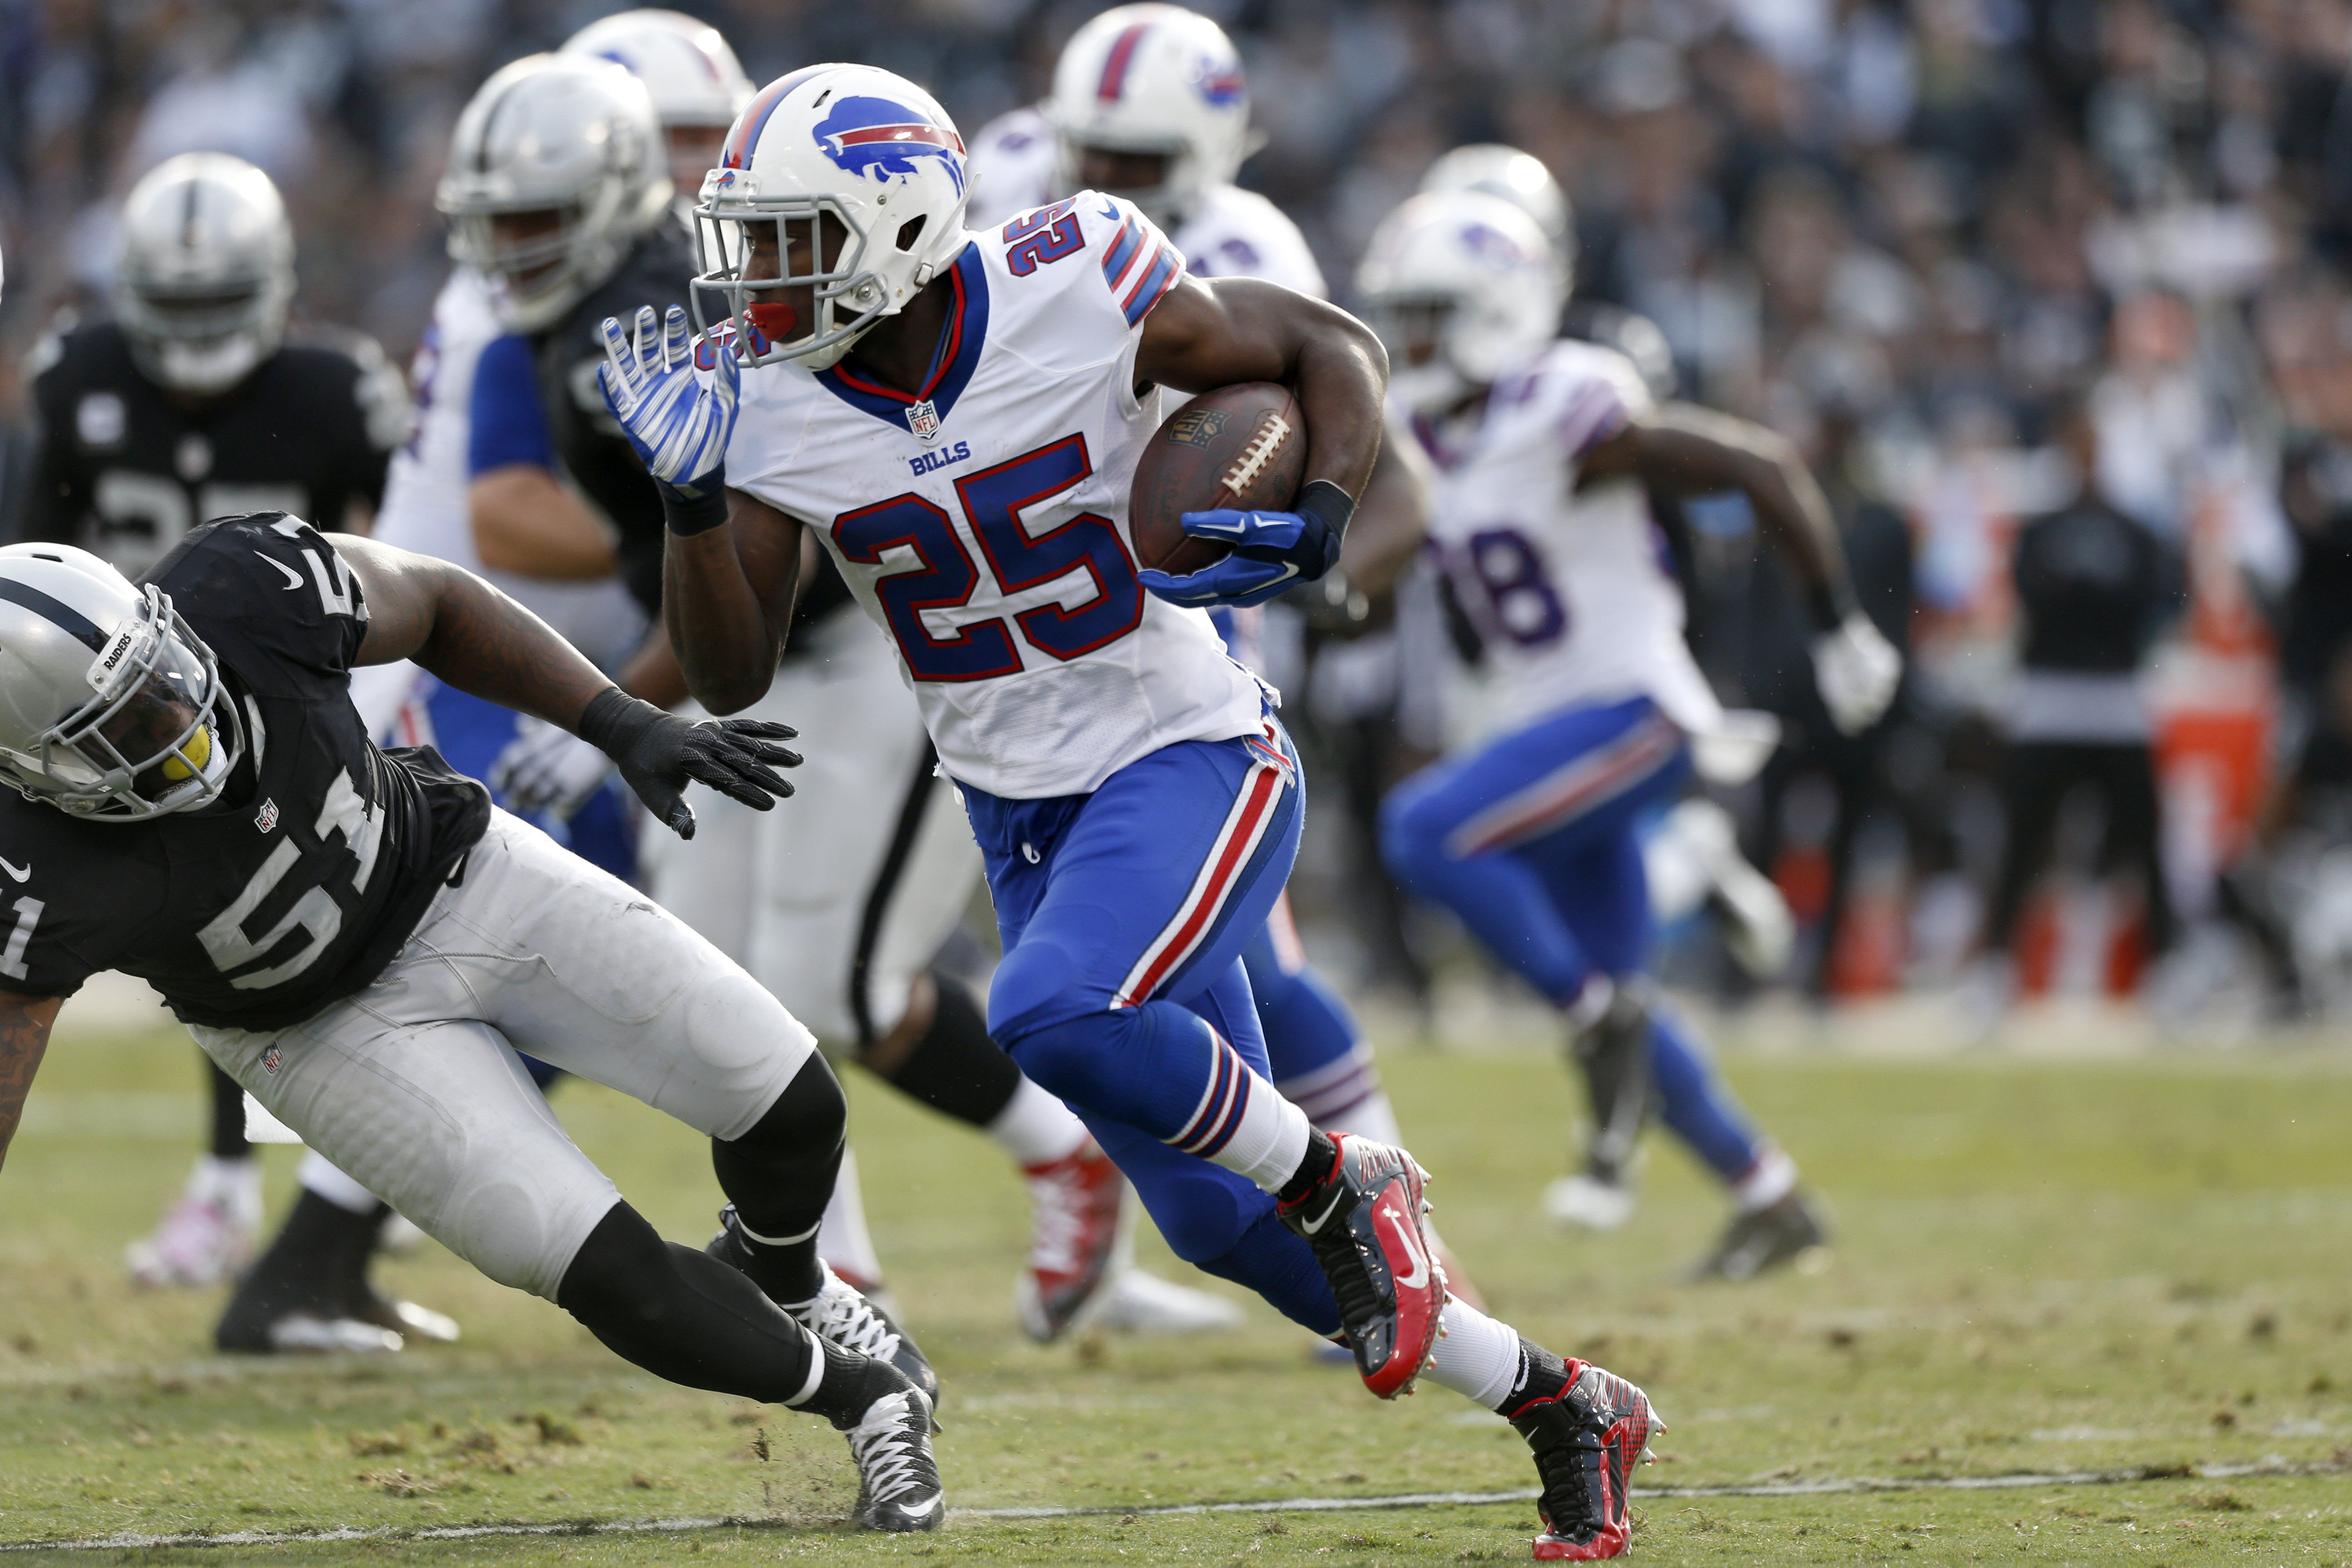 NFL: Buffalo Bills at Oakland Raiders